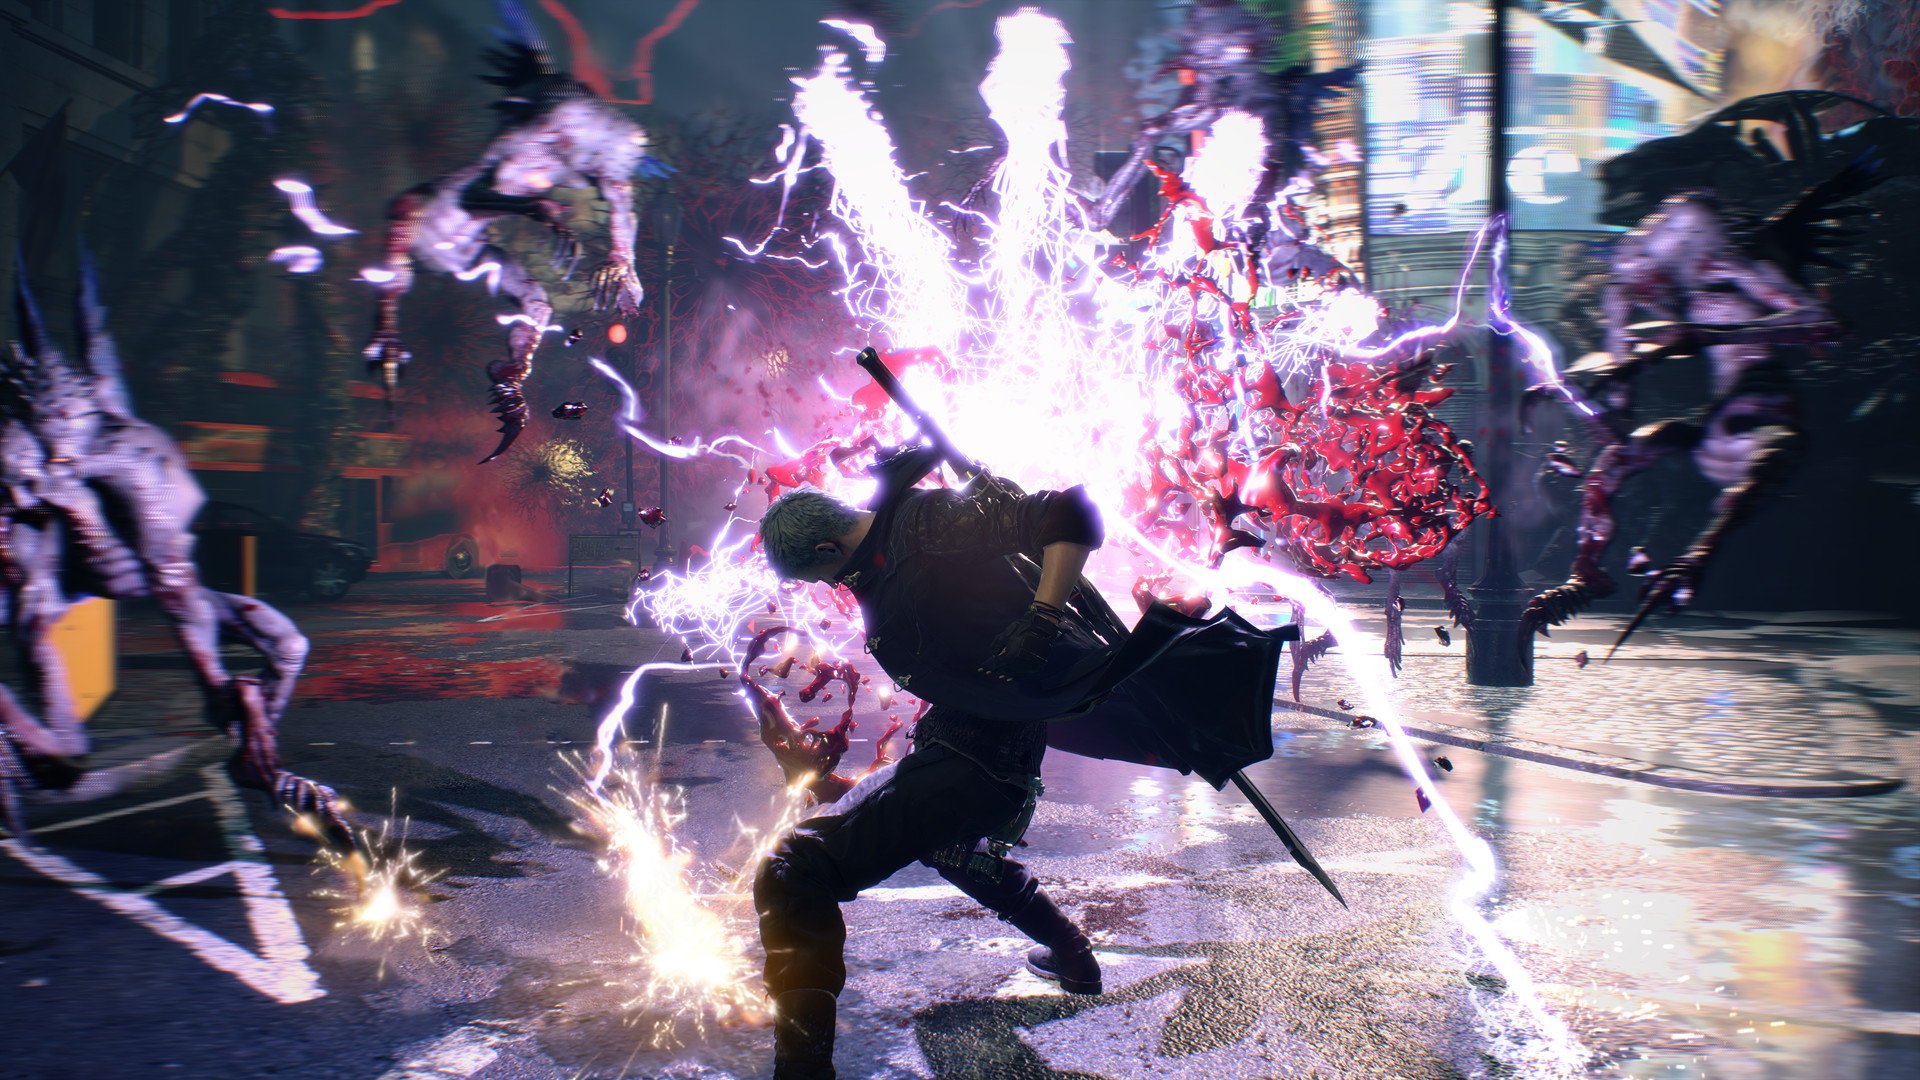 Devil May Cry 5 [PC PS4 XONE] Ss_4ce180ed8979a51c72de51f985e9e9ba13500508